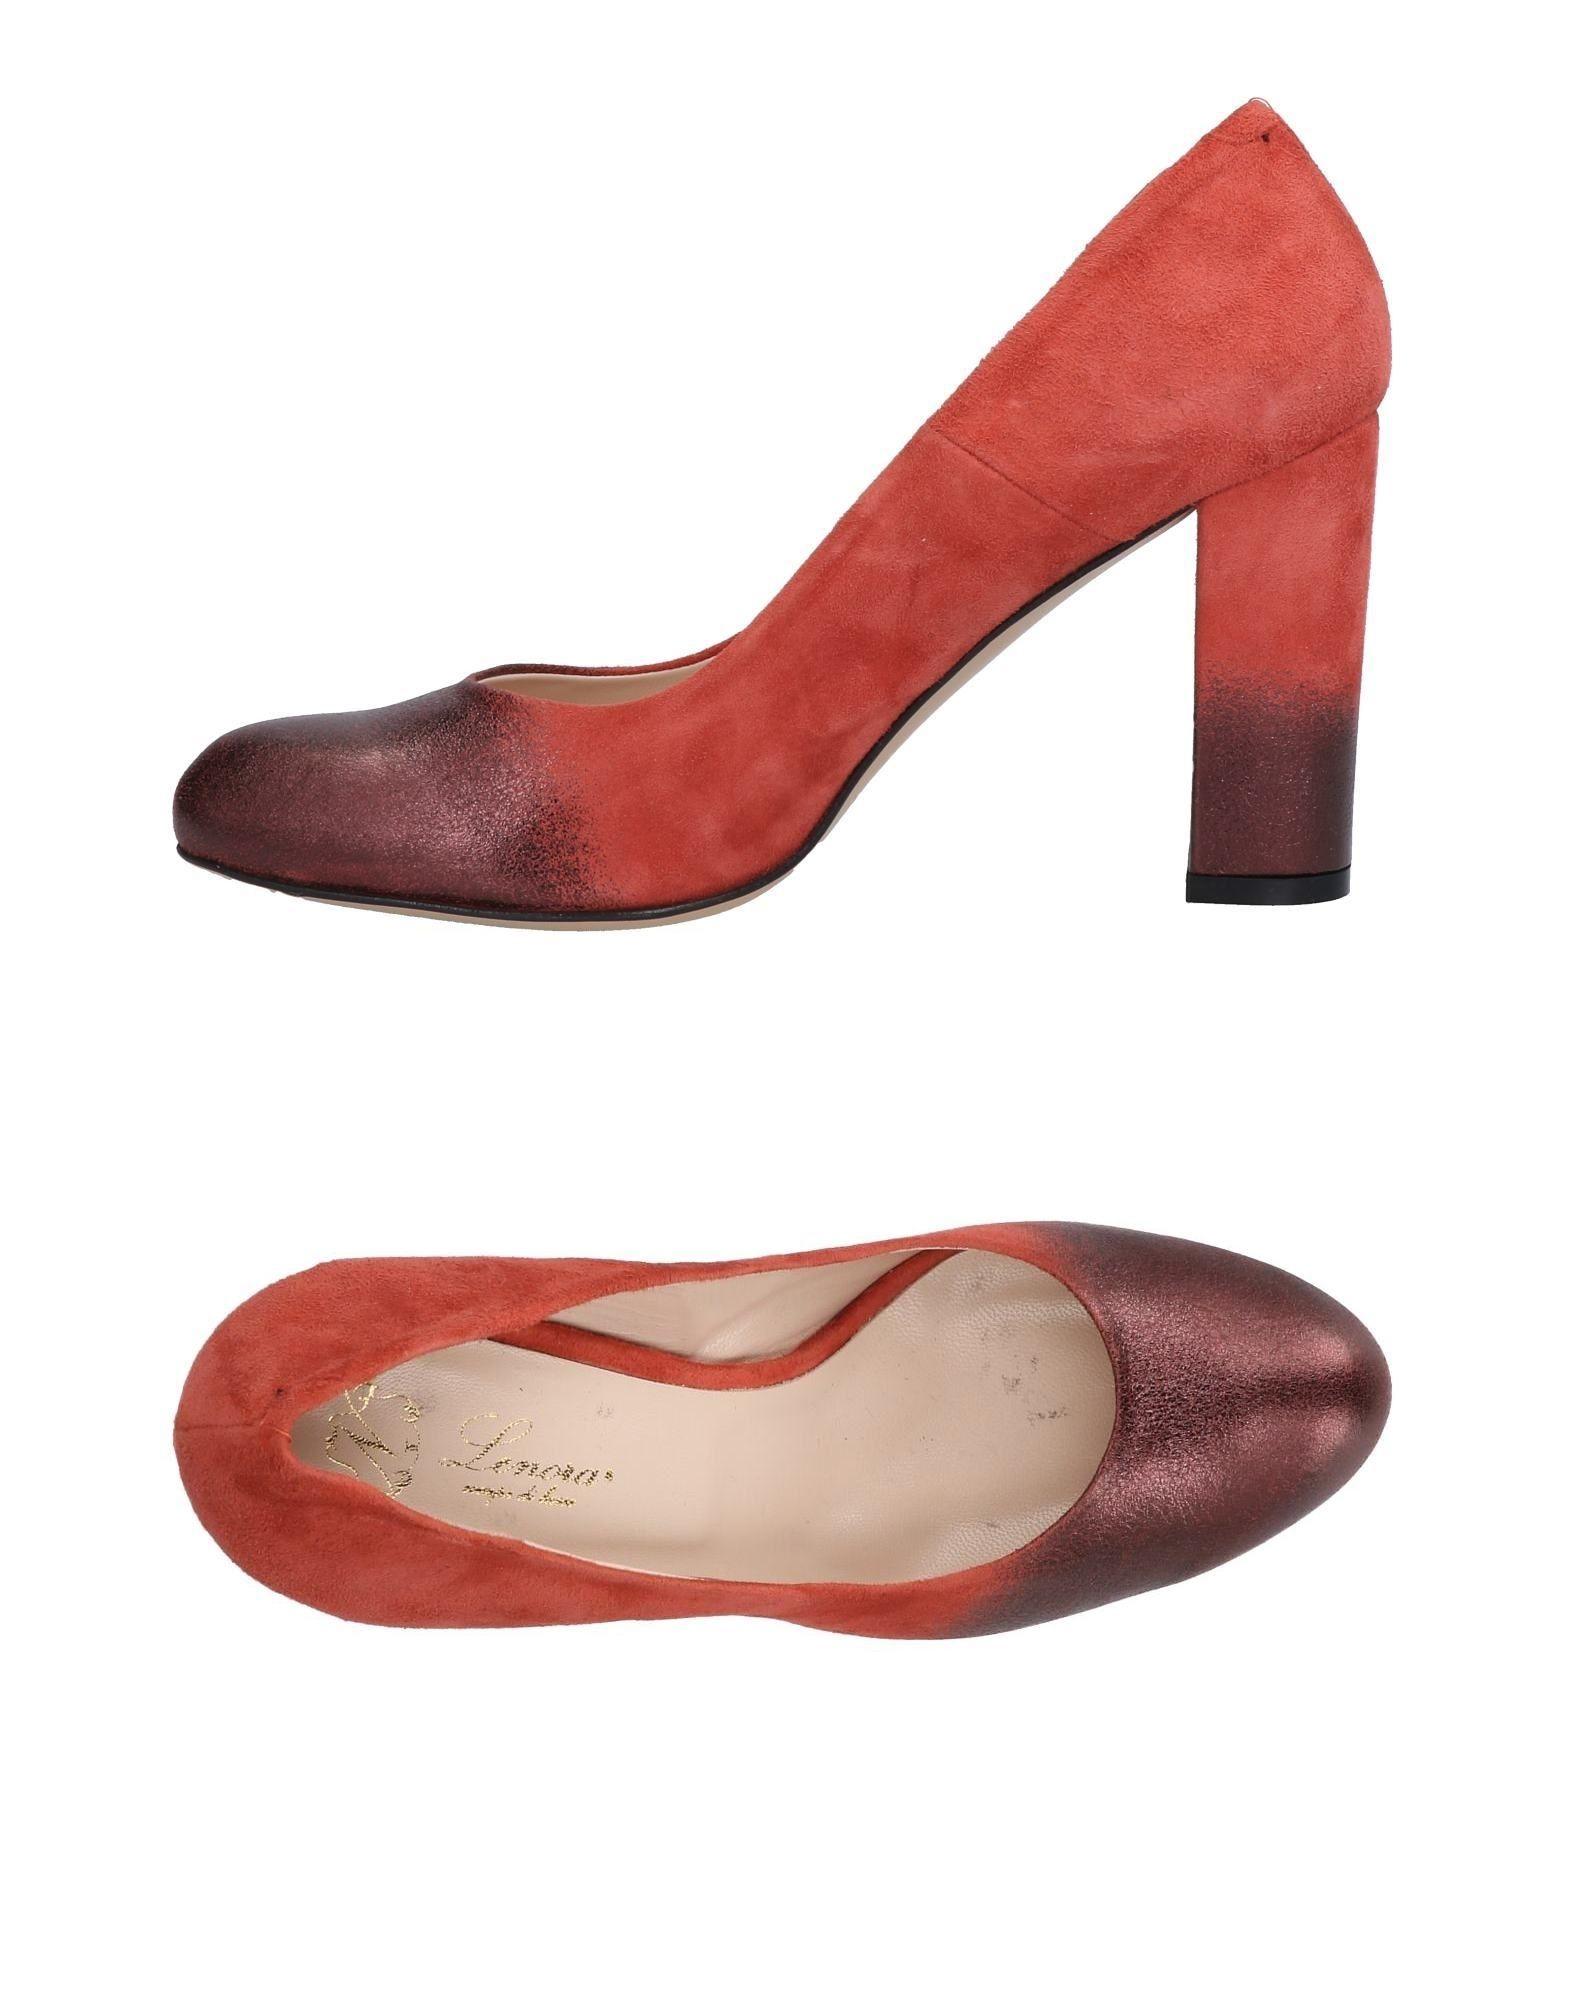 Haltbare Mode billige Schuhe Lenora Pumps Damen  11216807SS Heiße Schuhe